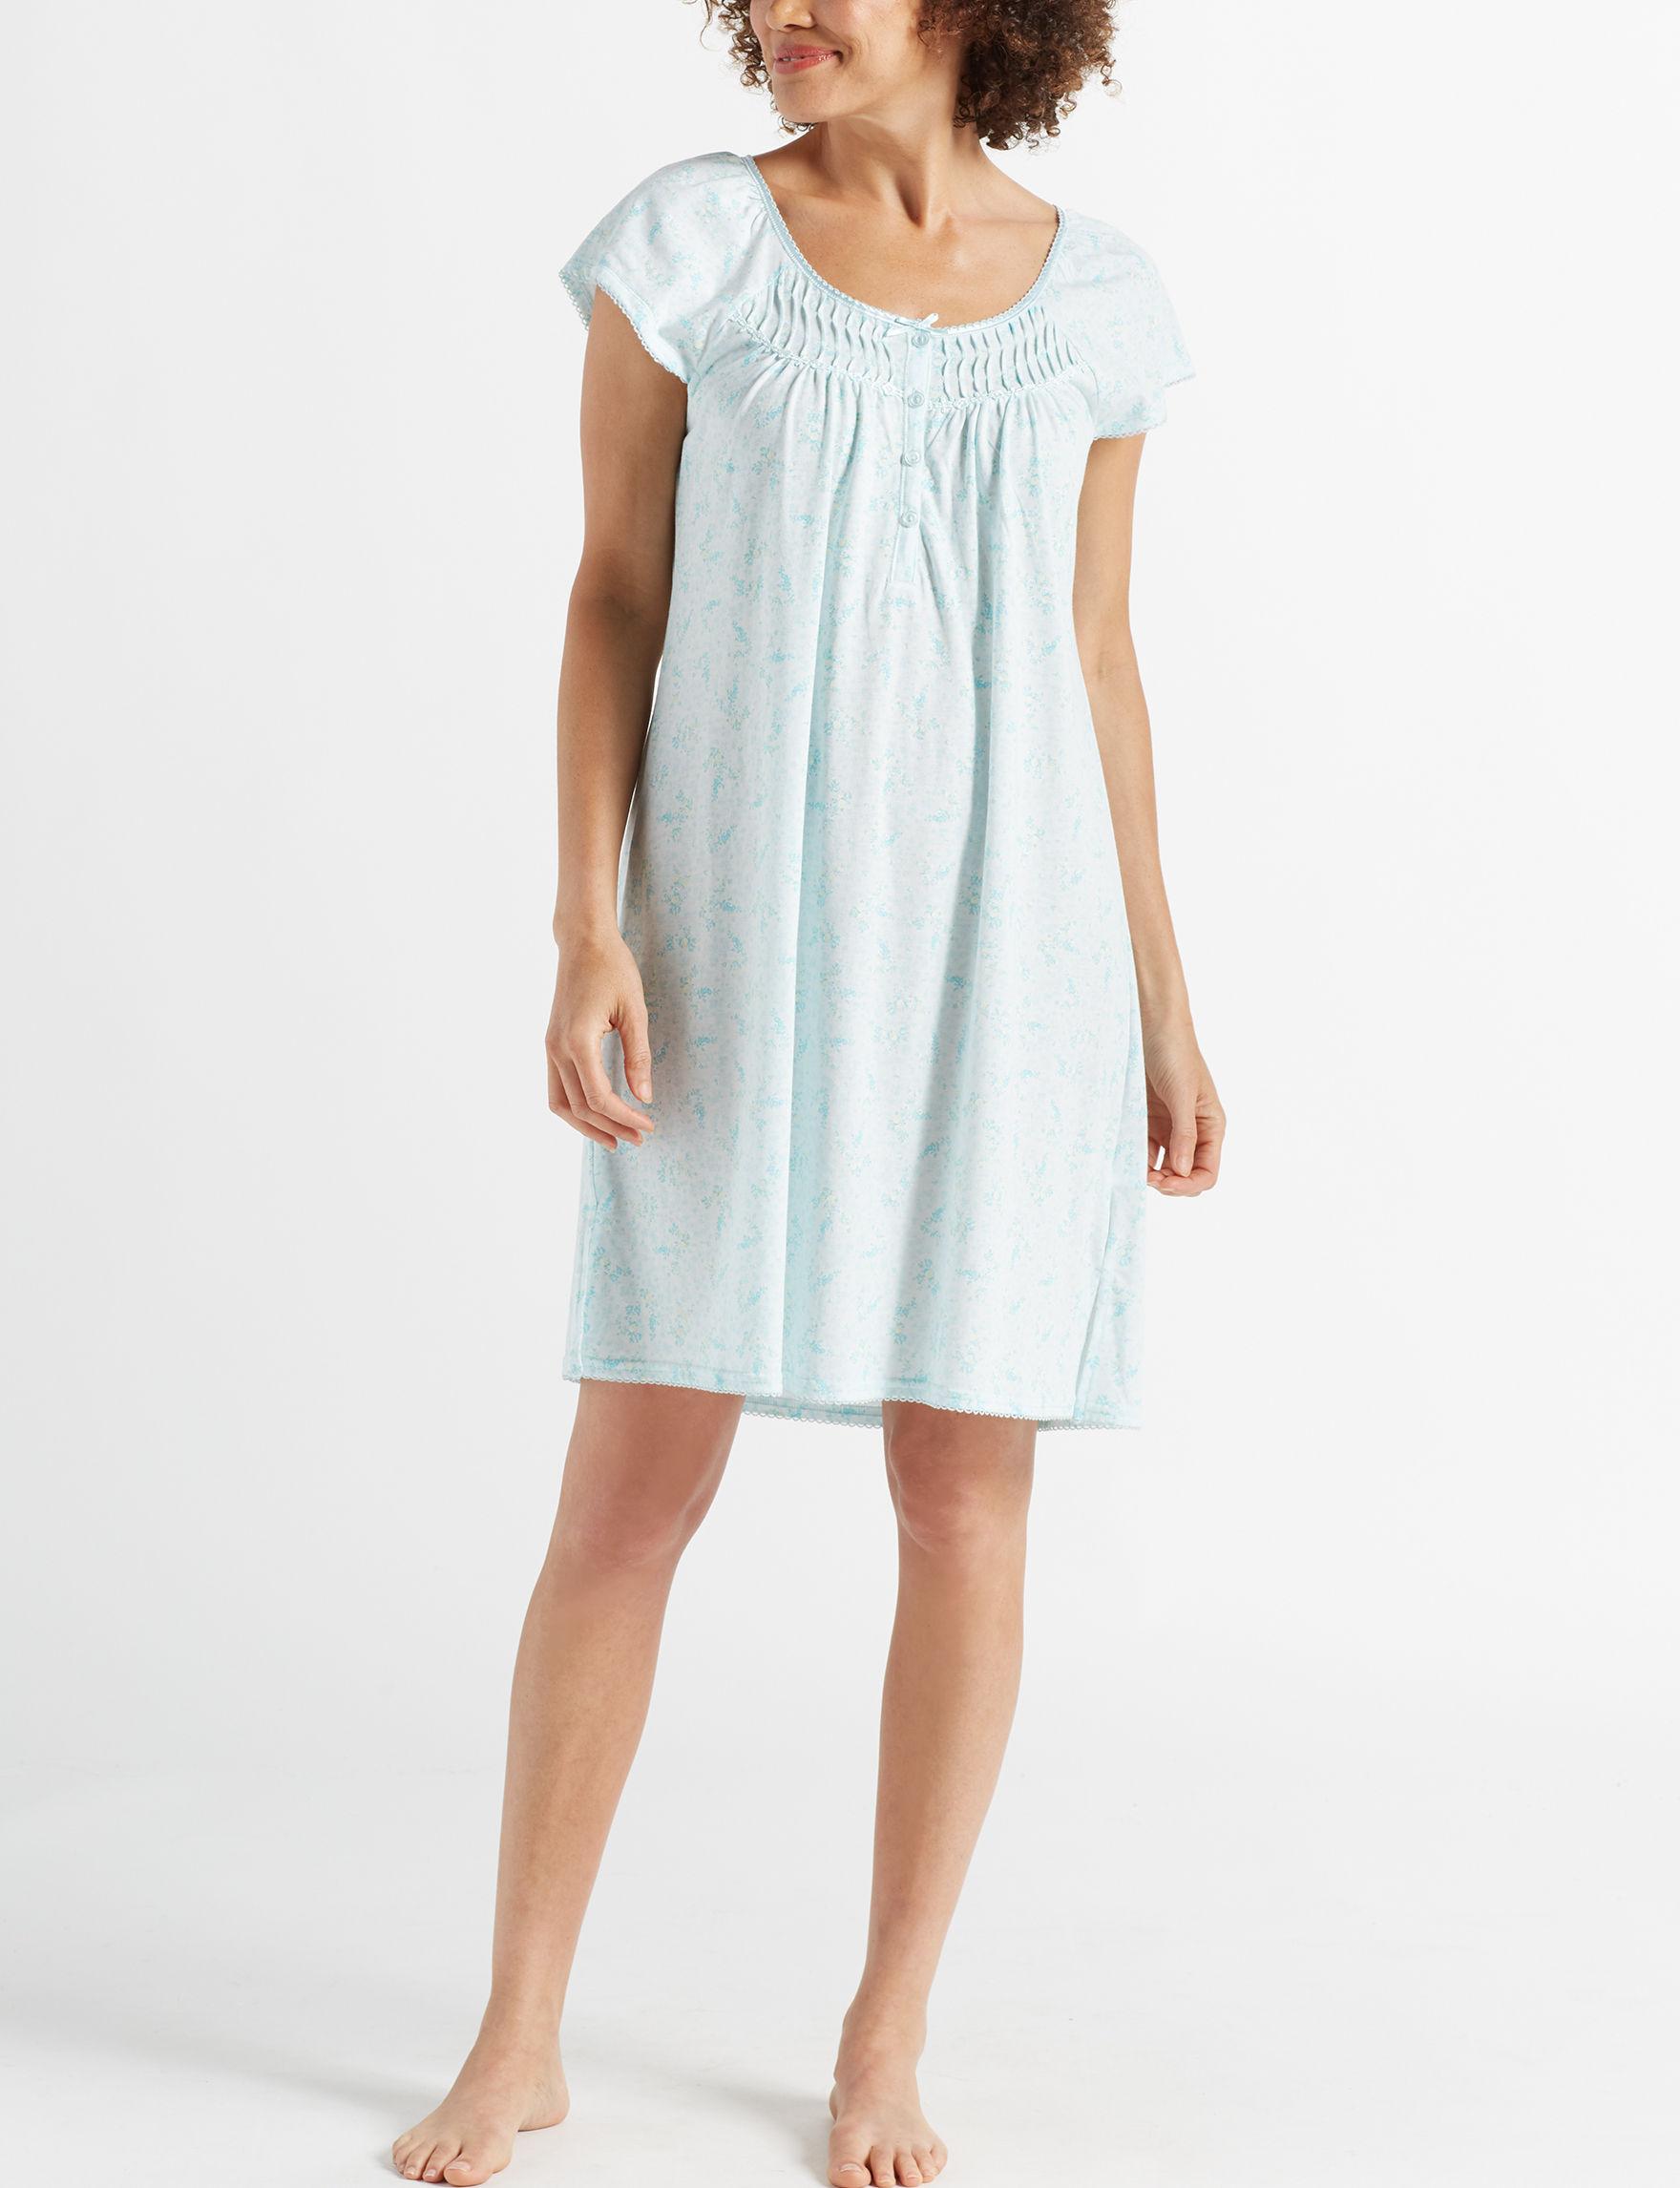 Miss Elaine Blue Floral Nightgowns & Sleep Shirts